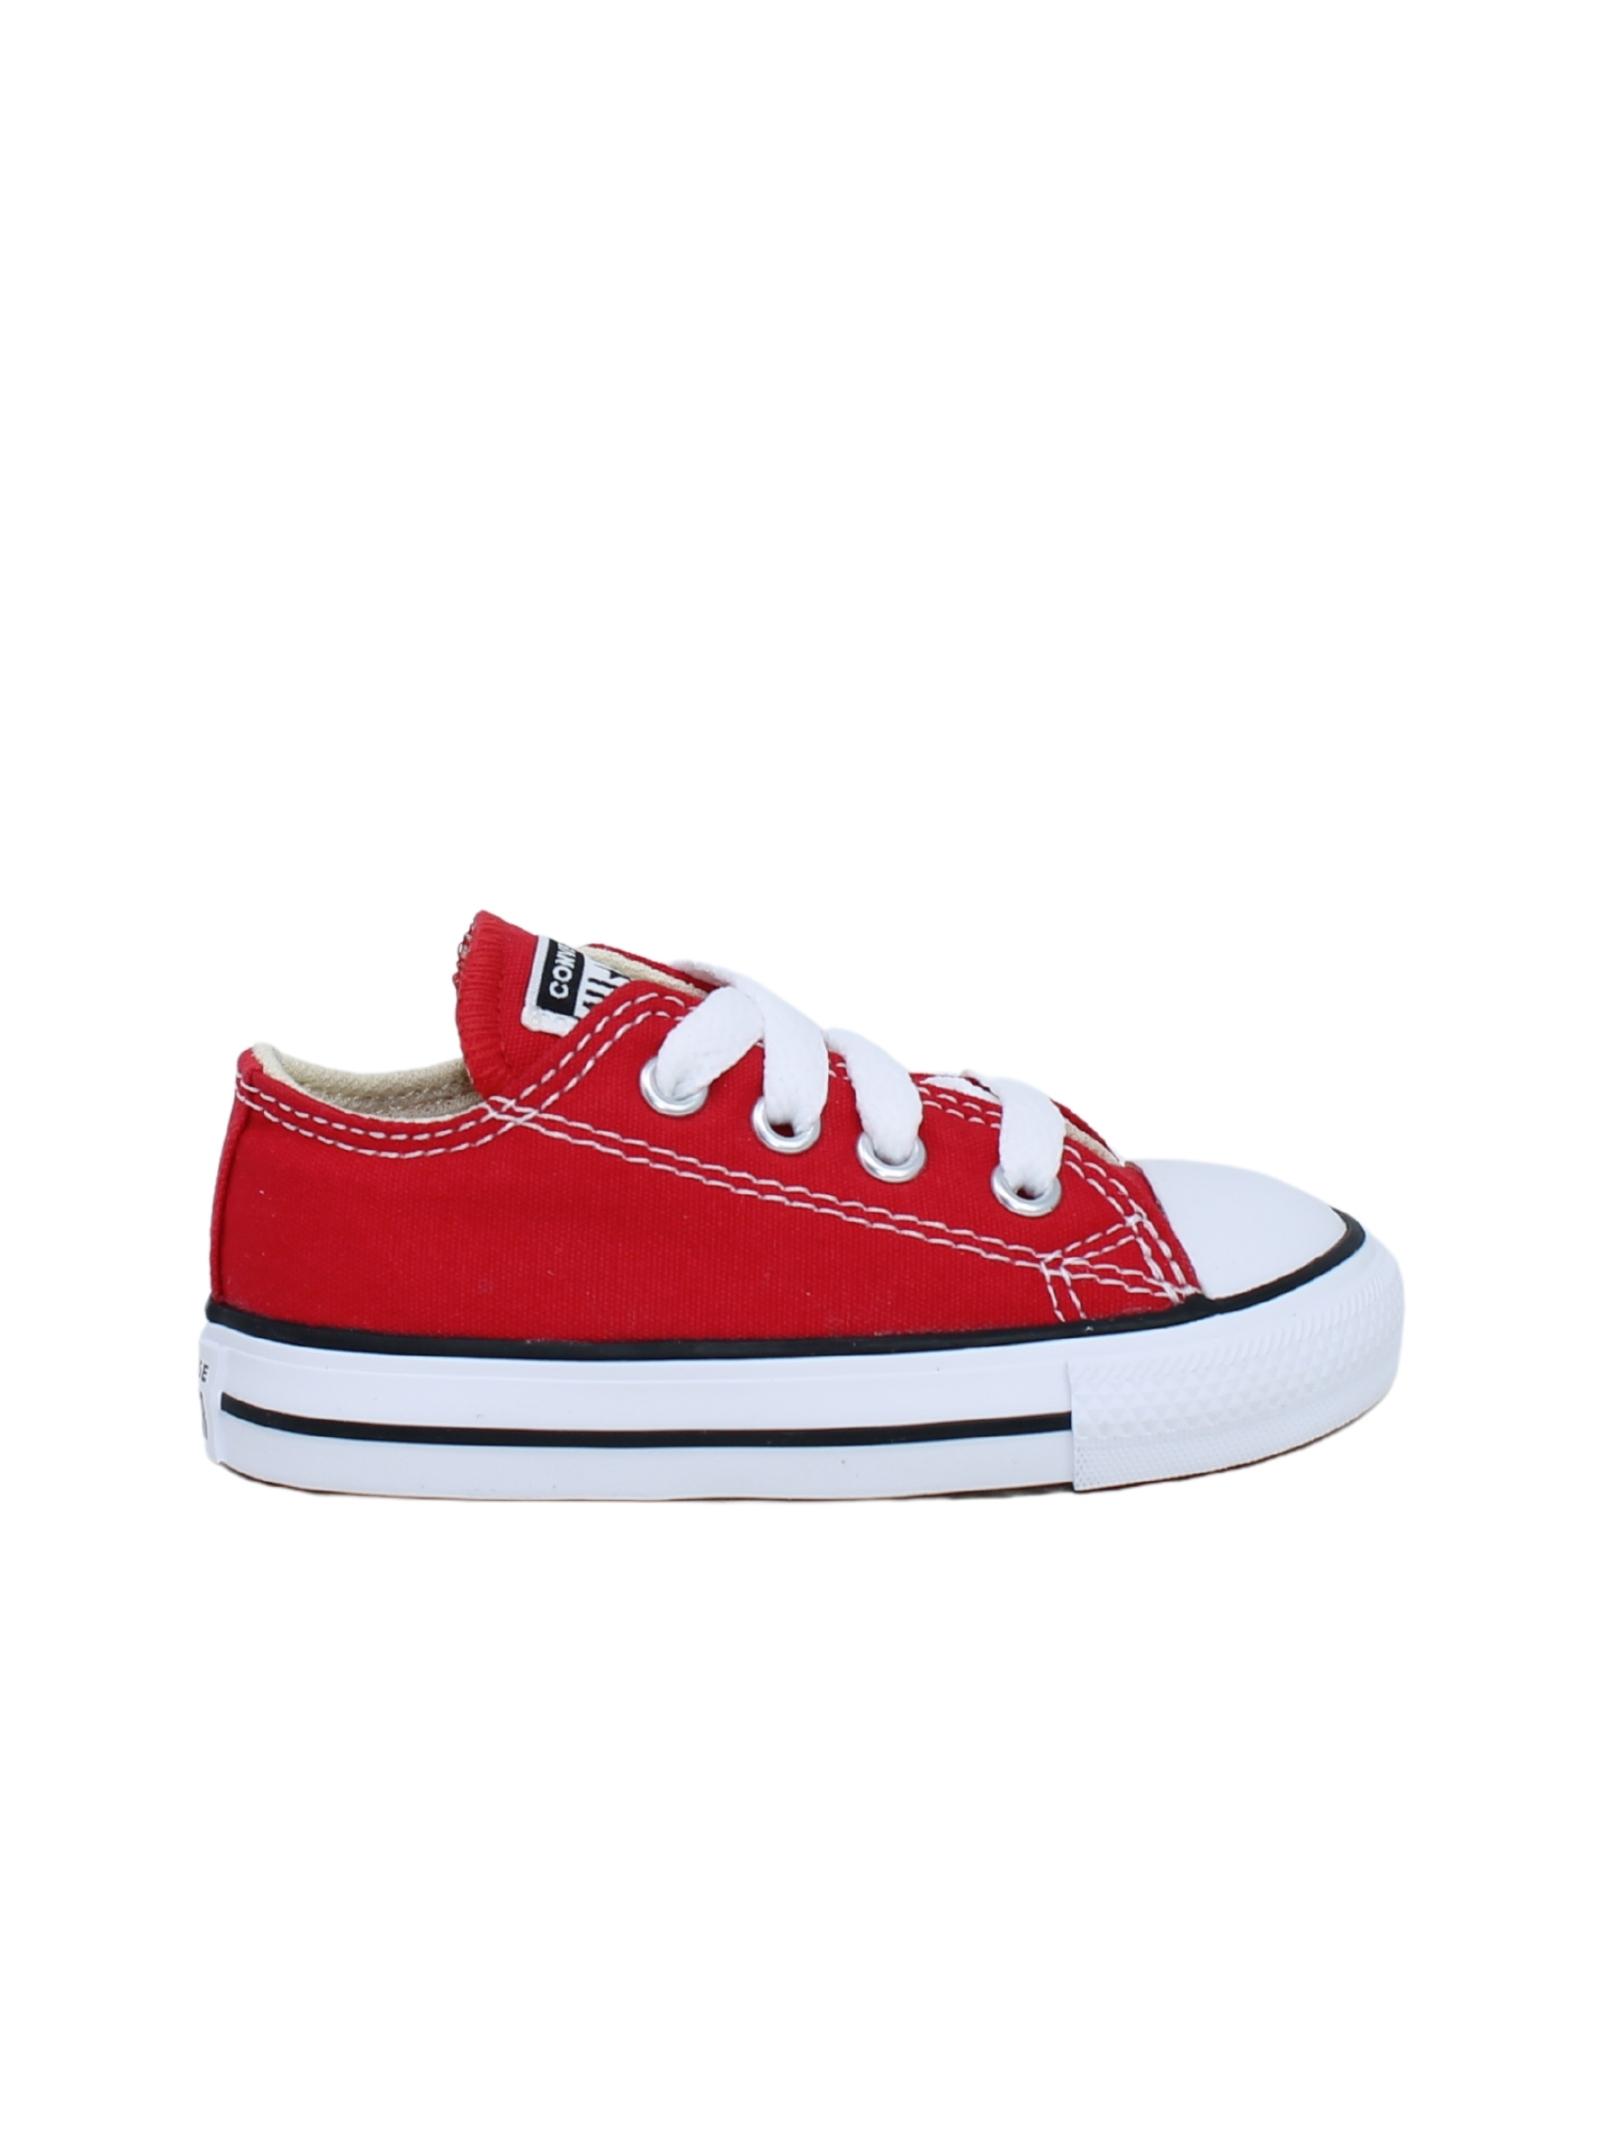 Converse Bambina Red CONVERSE KIDS | Sneakers | 7J236CROSSA